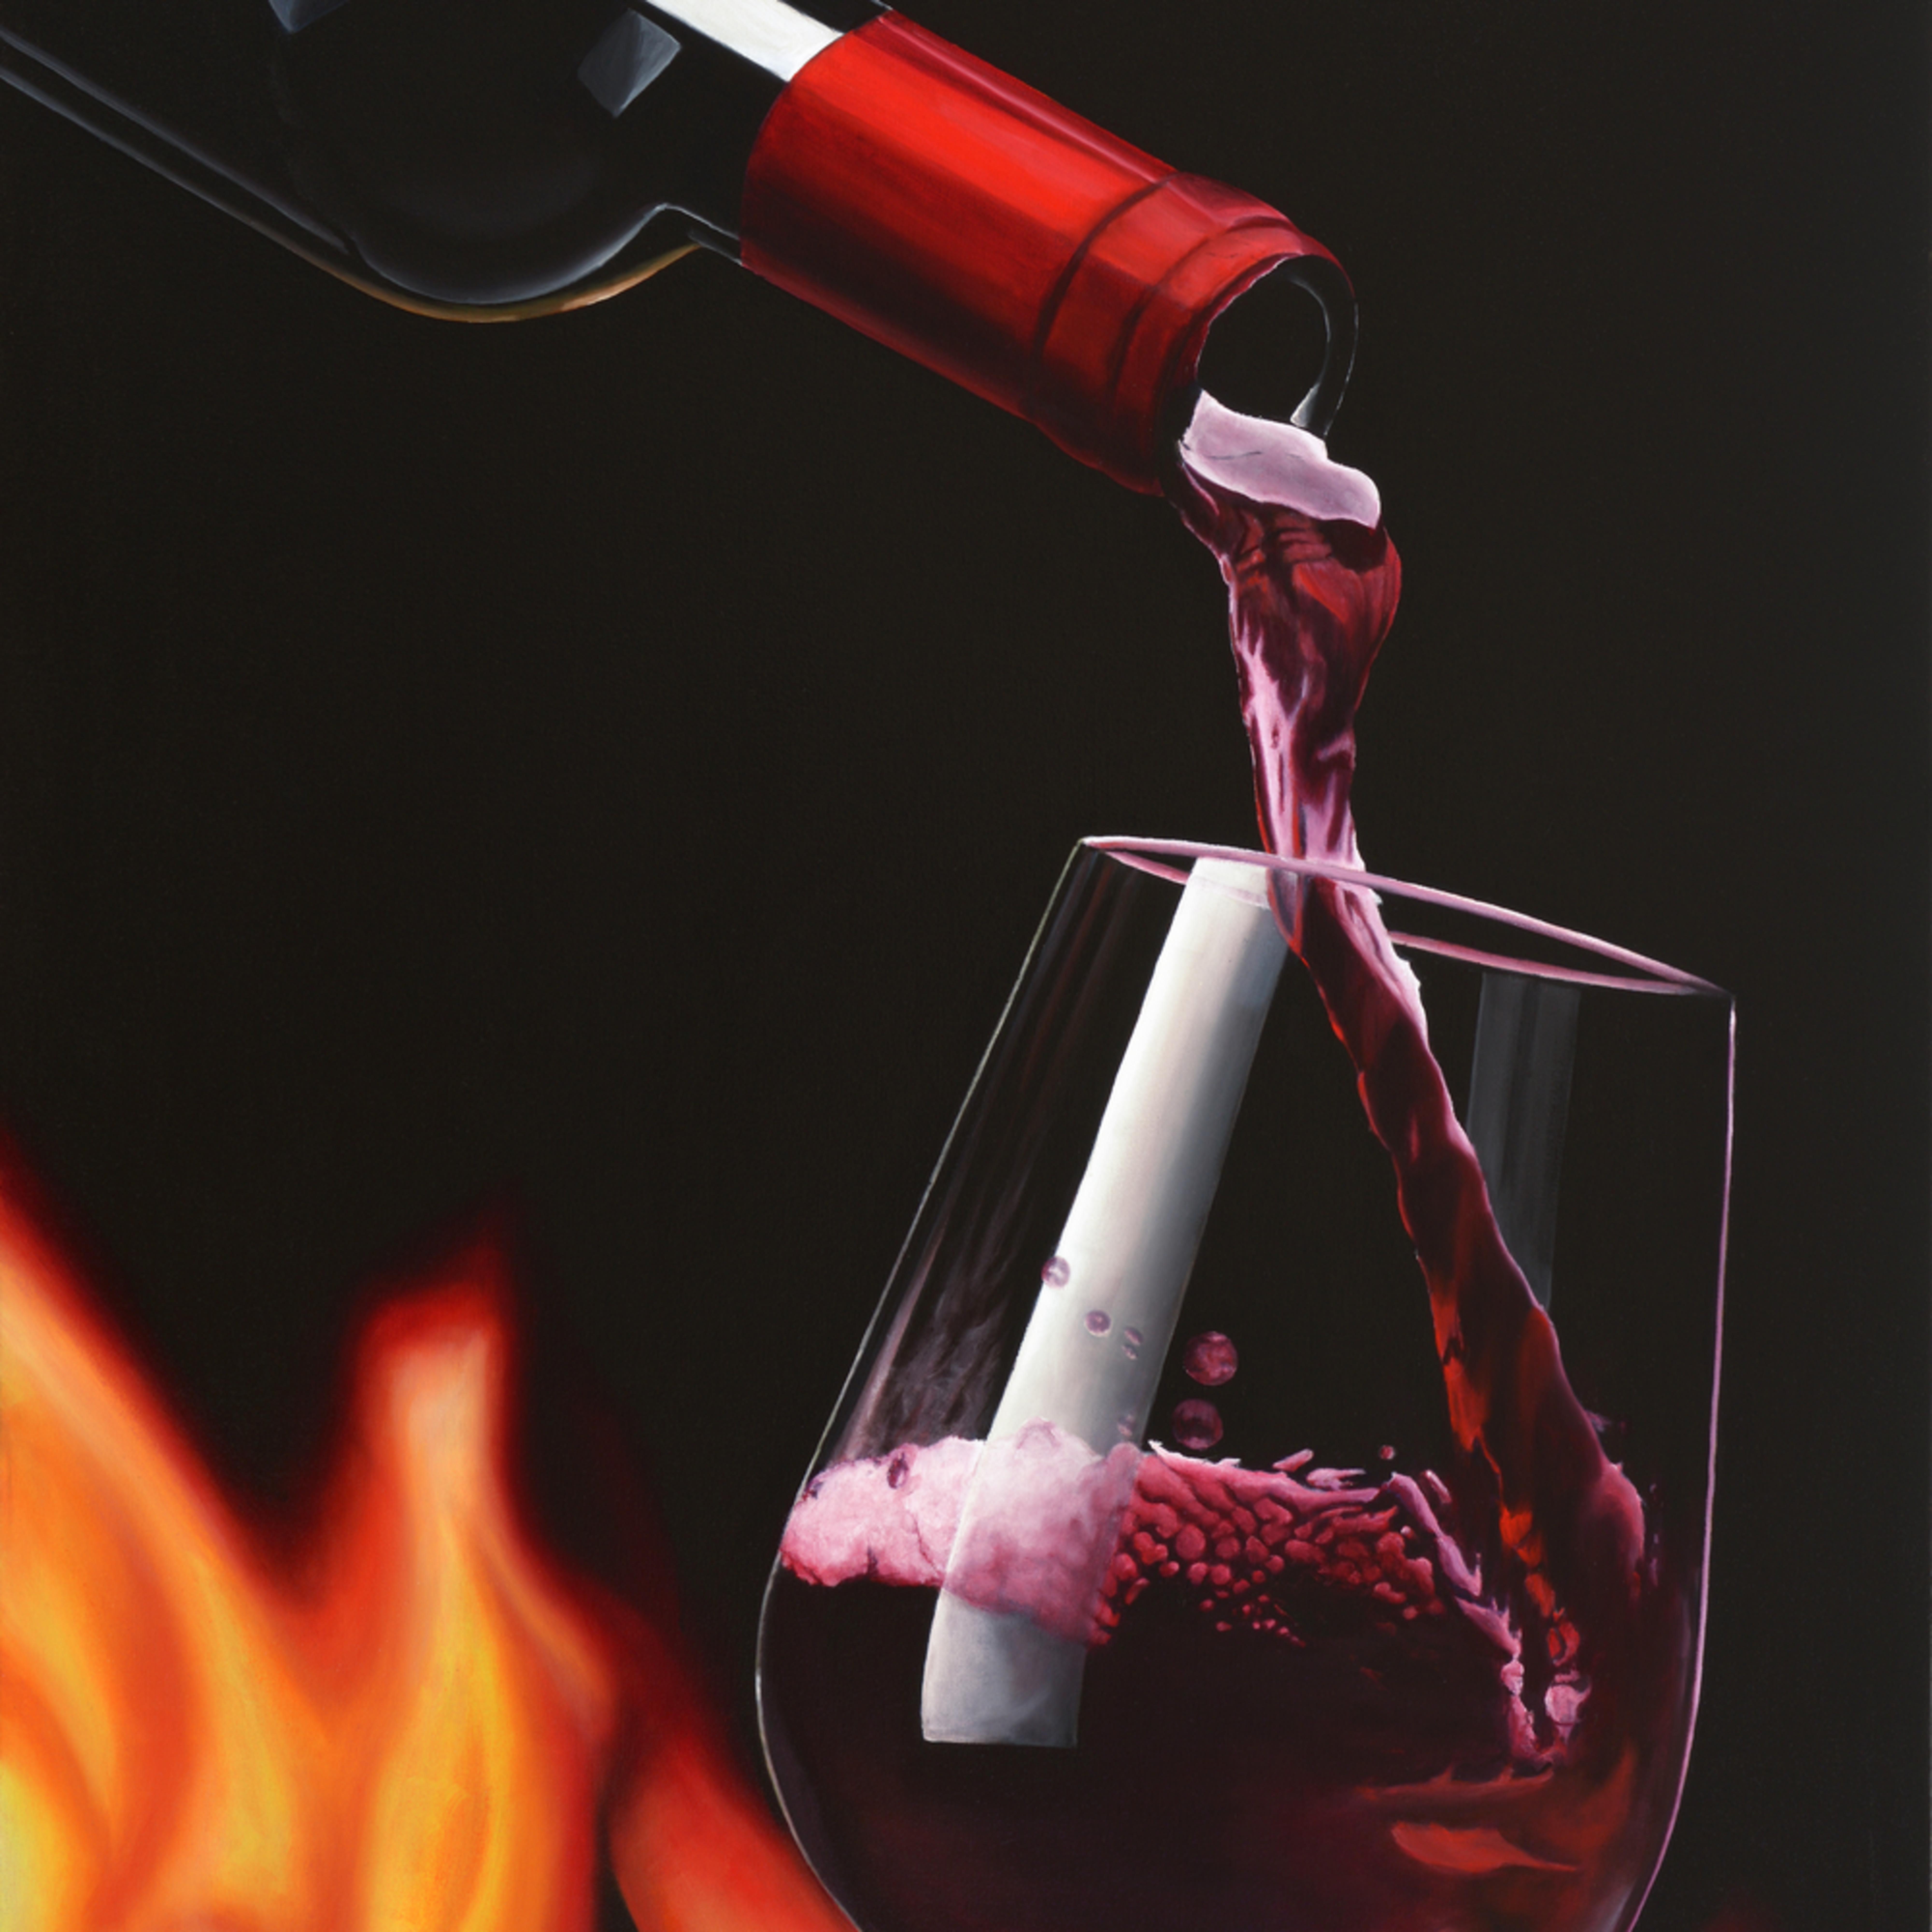 Ohh wine full vr1awc